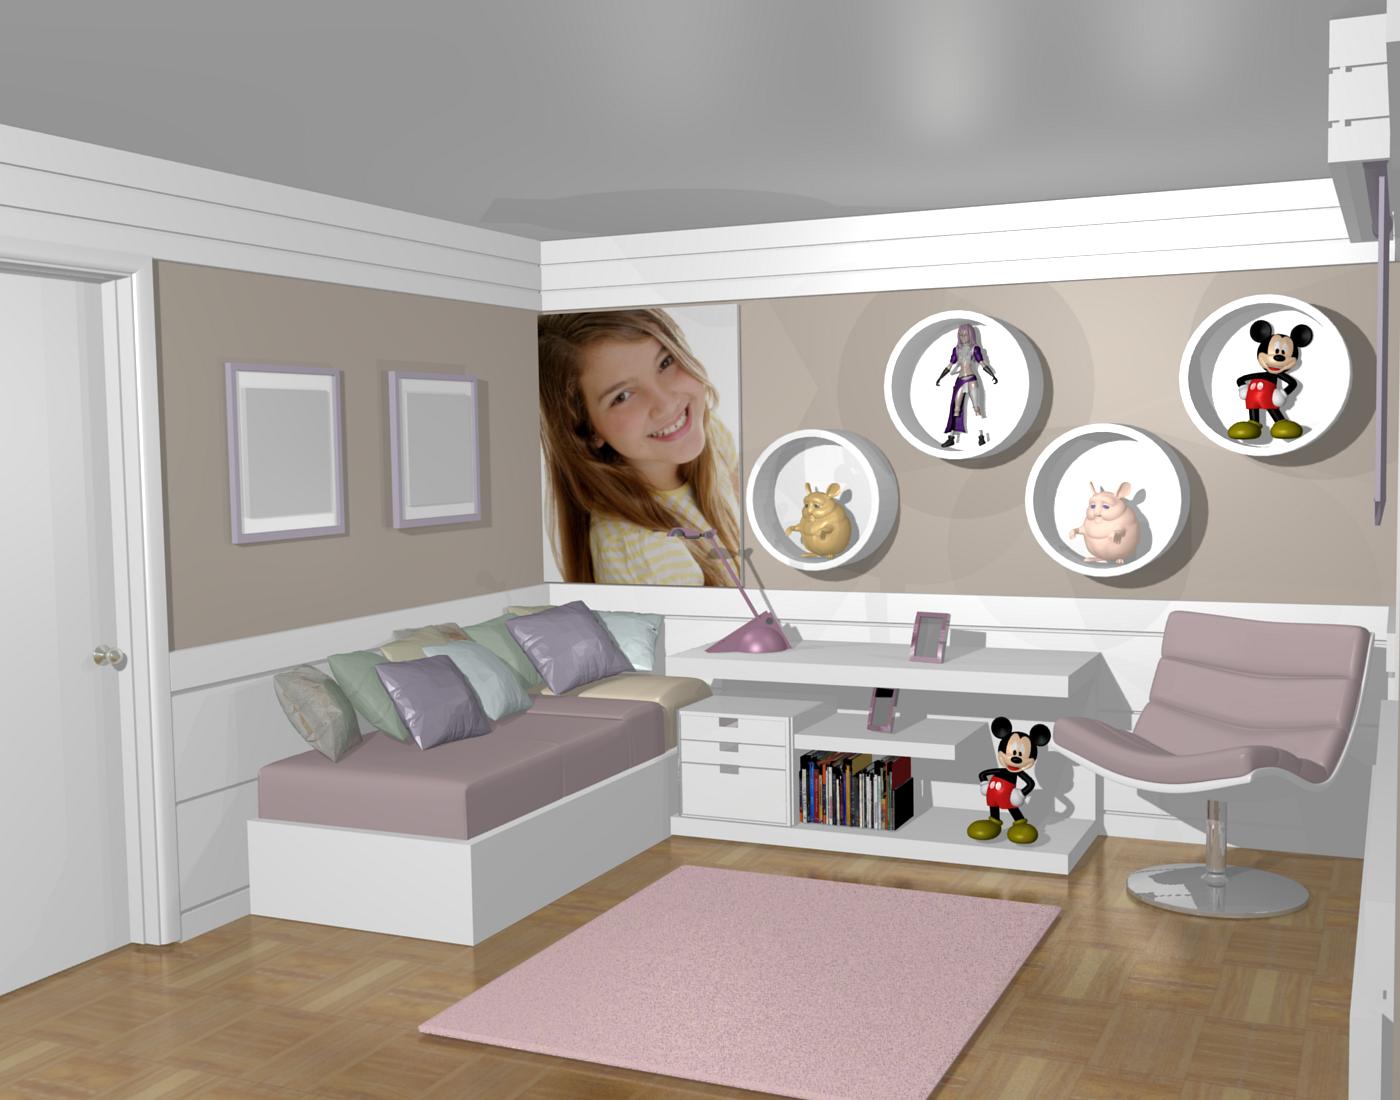 Armarios planejados quarto menina bebe moveis cozinha marcenaria painel tv lcd closet indos - Armarios de bebe ...